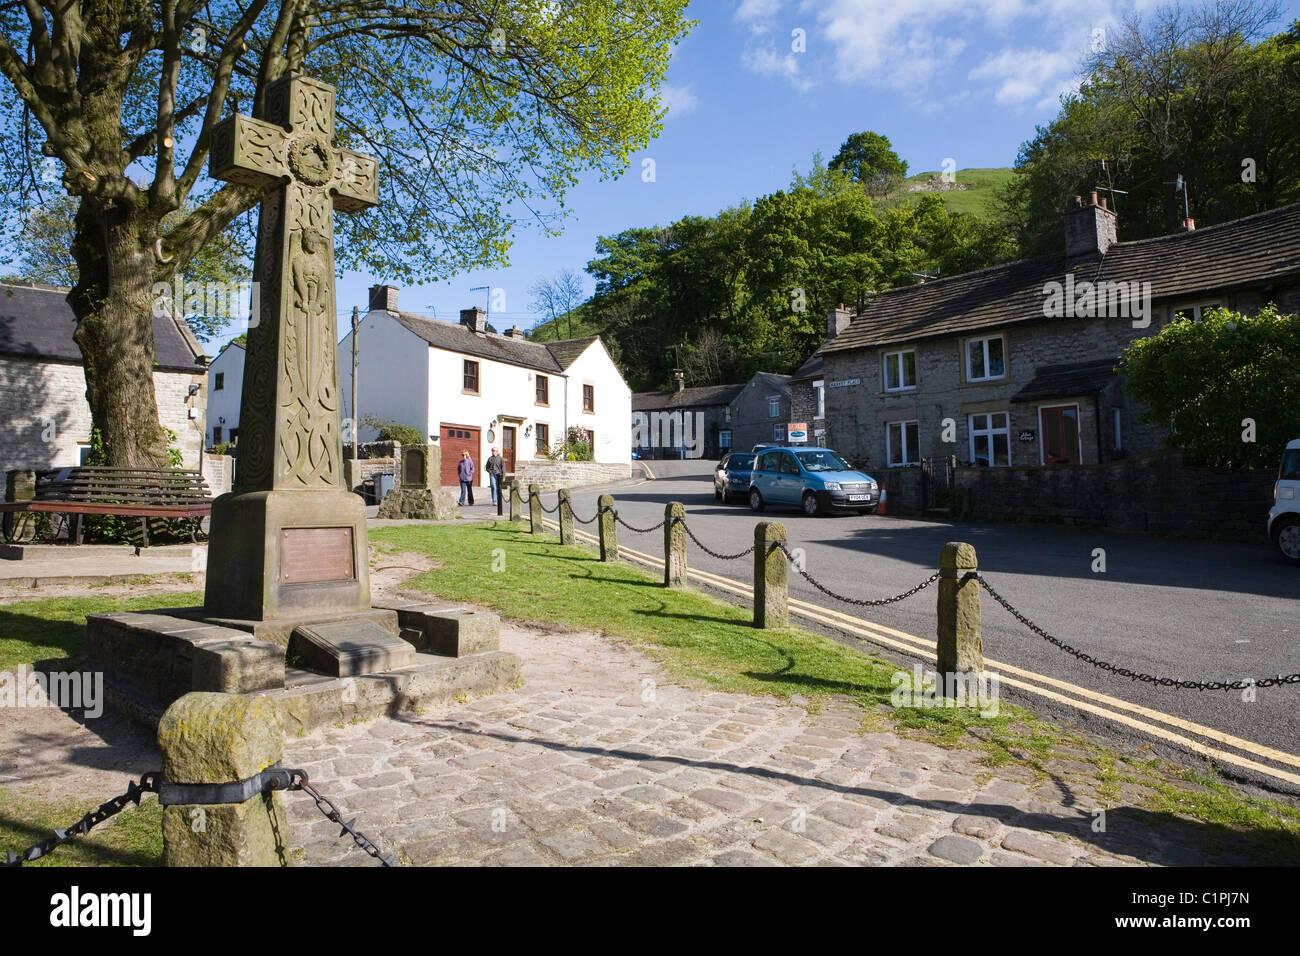 England, Derbyshire, Castleton, Saxon cross in market square in village - Stock Image